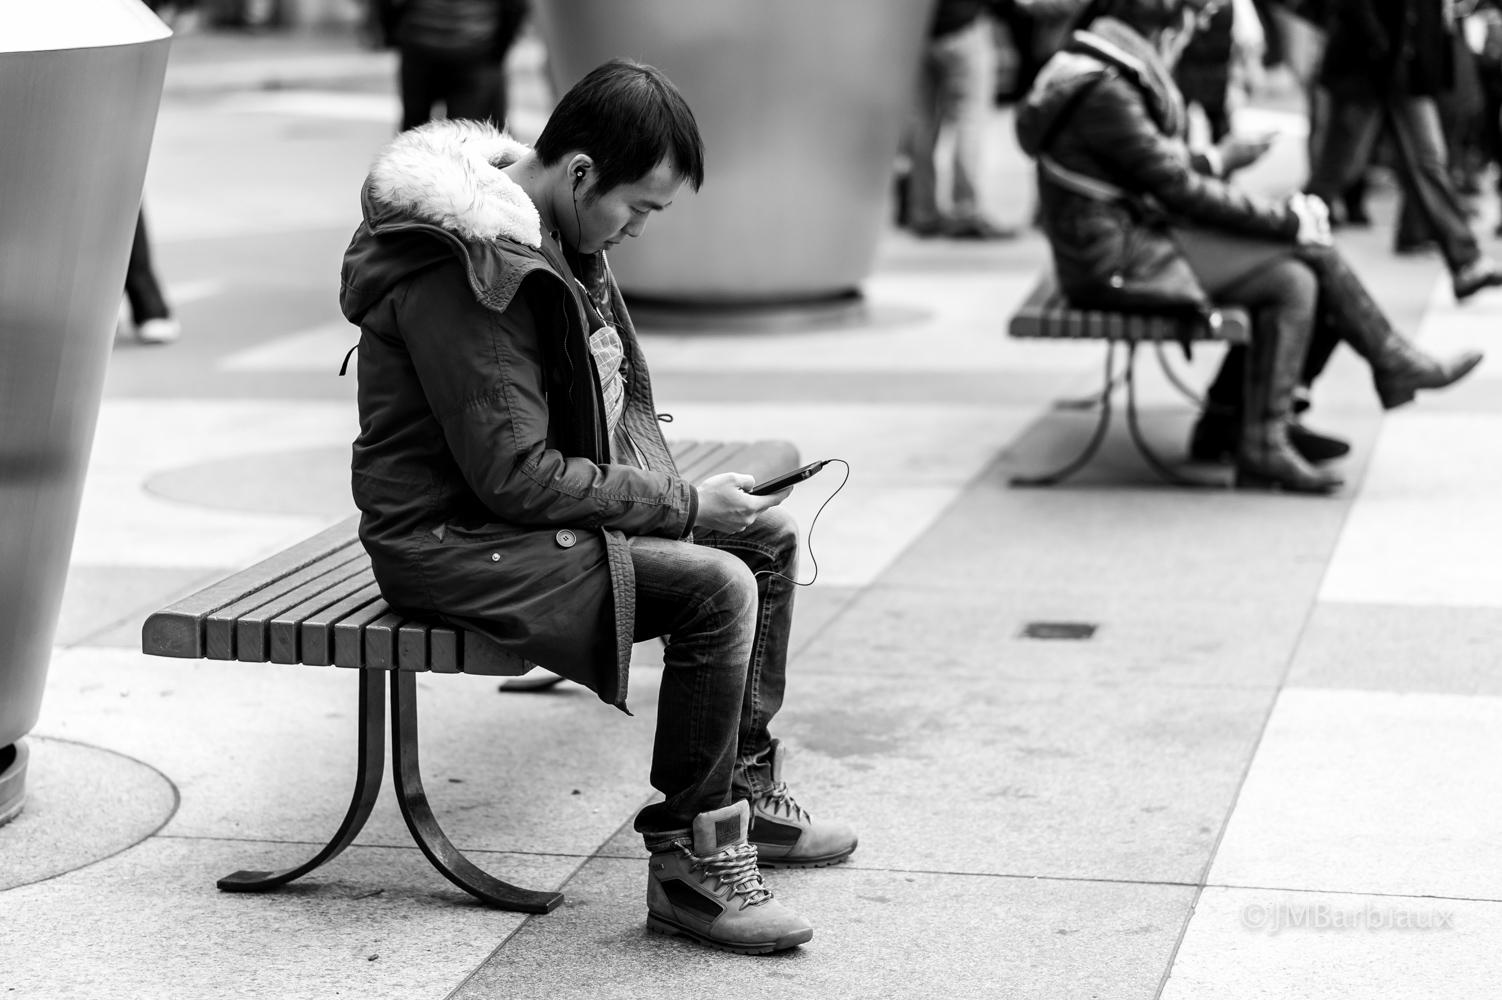 Street Photography Composition – Layering | DecisiveShot